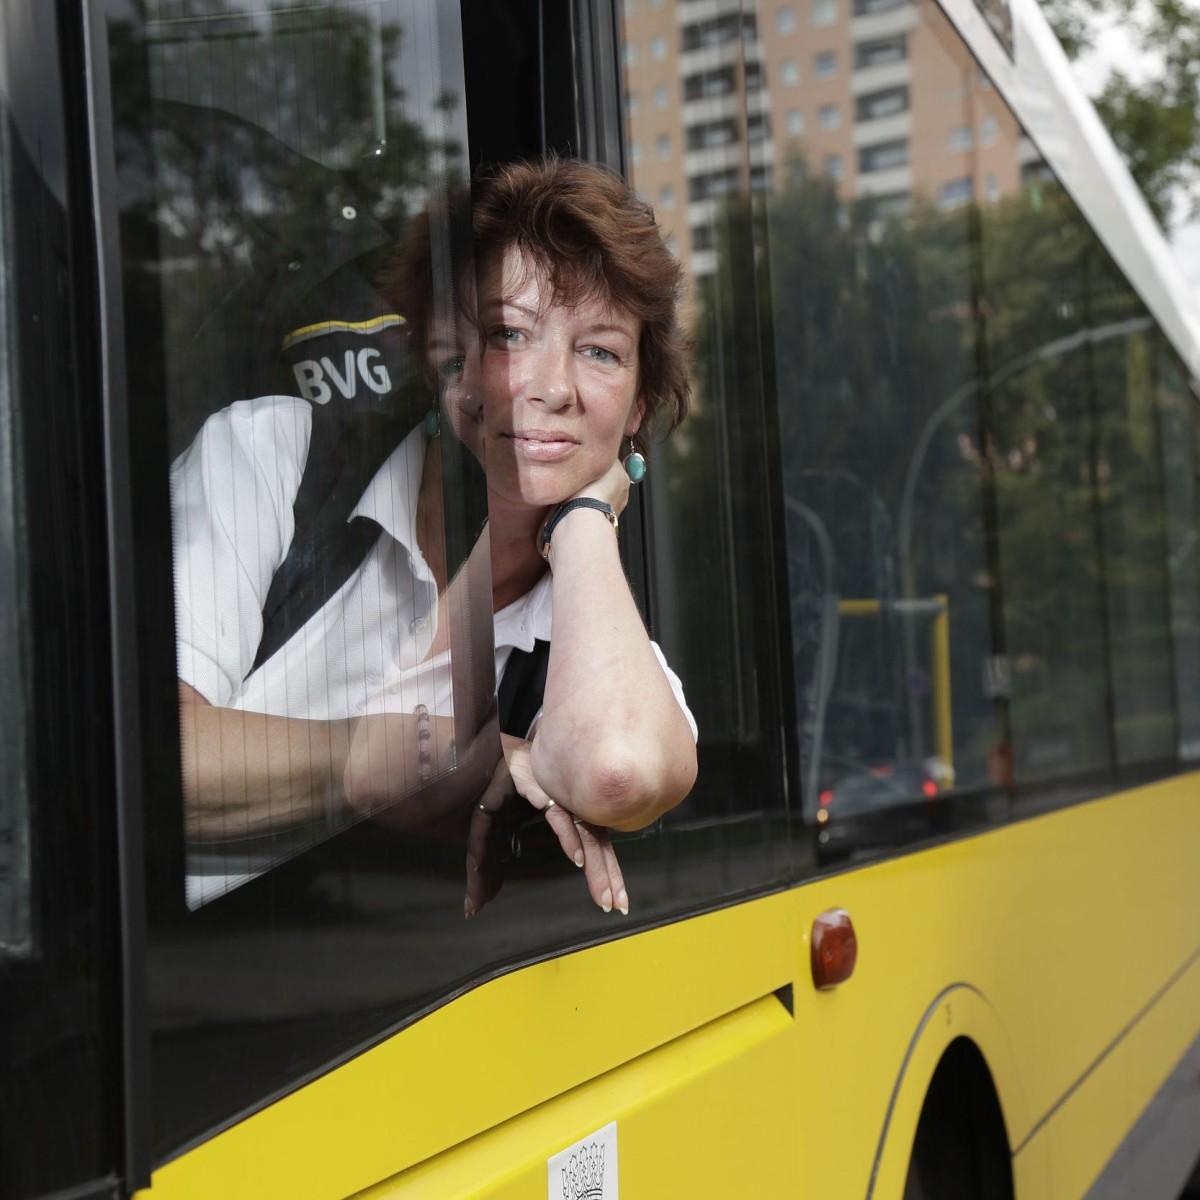 Bus im frau nackt Bus